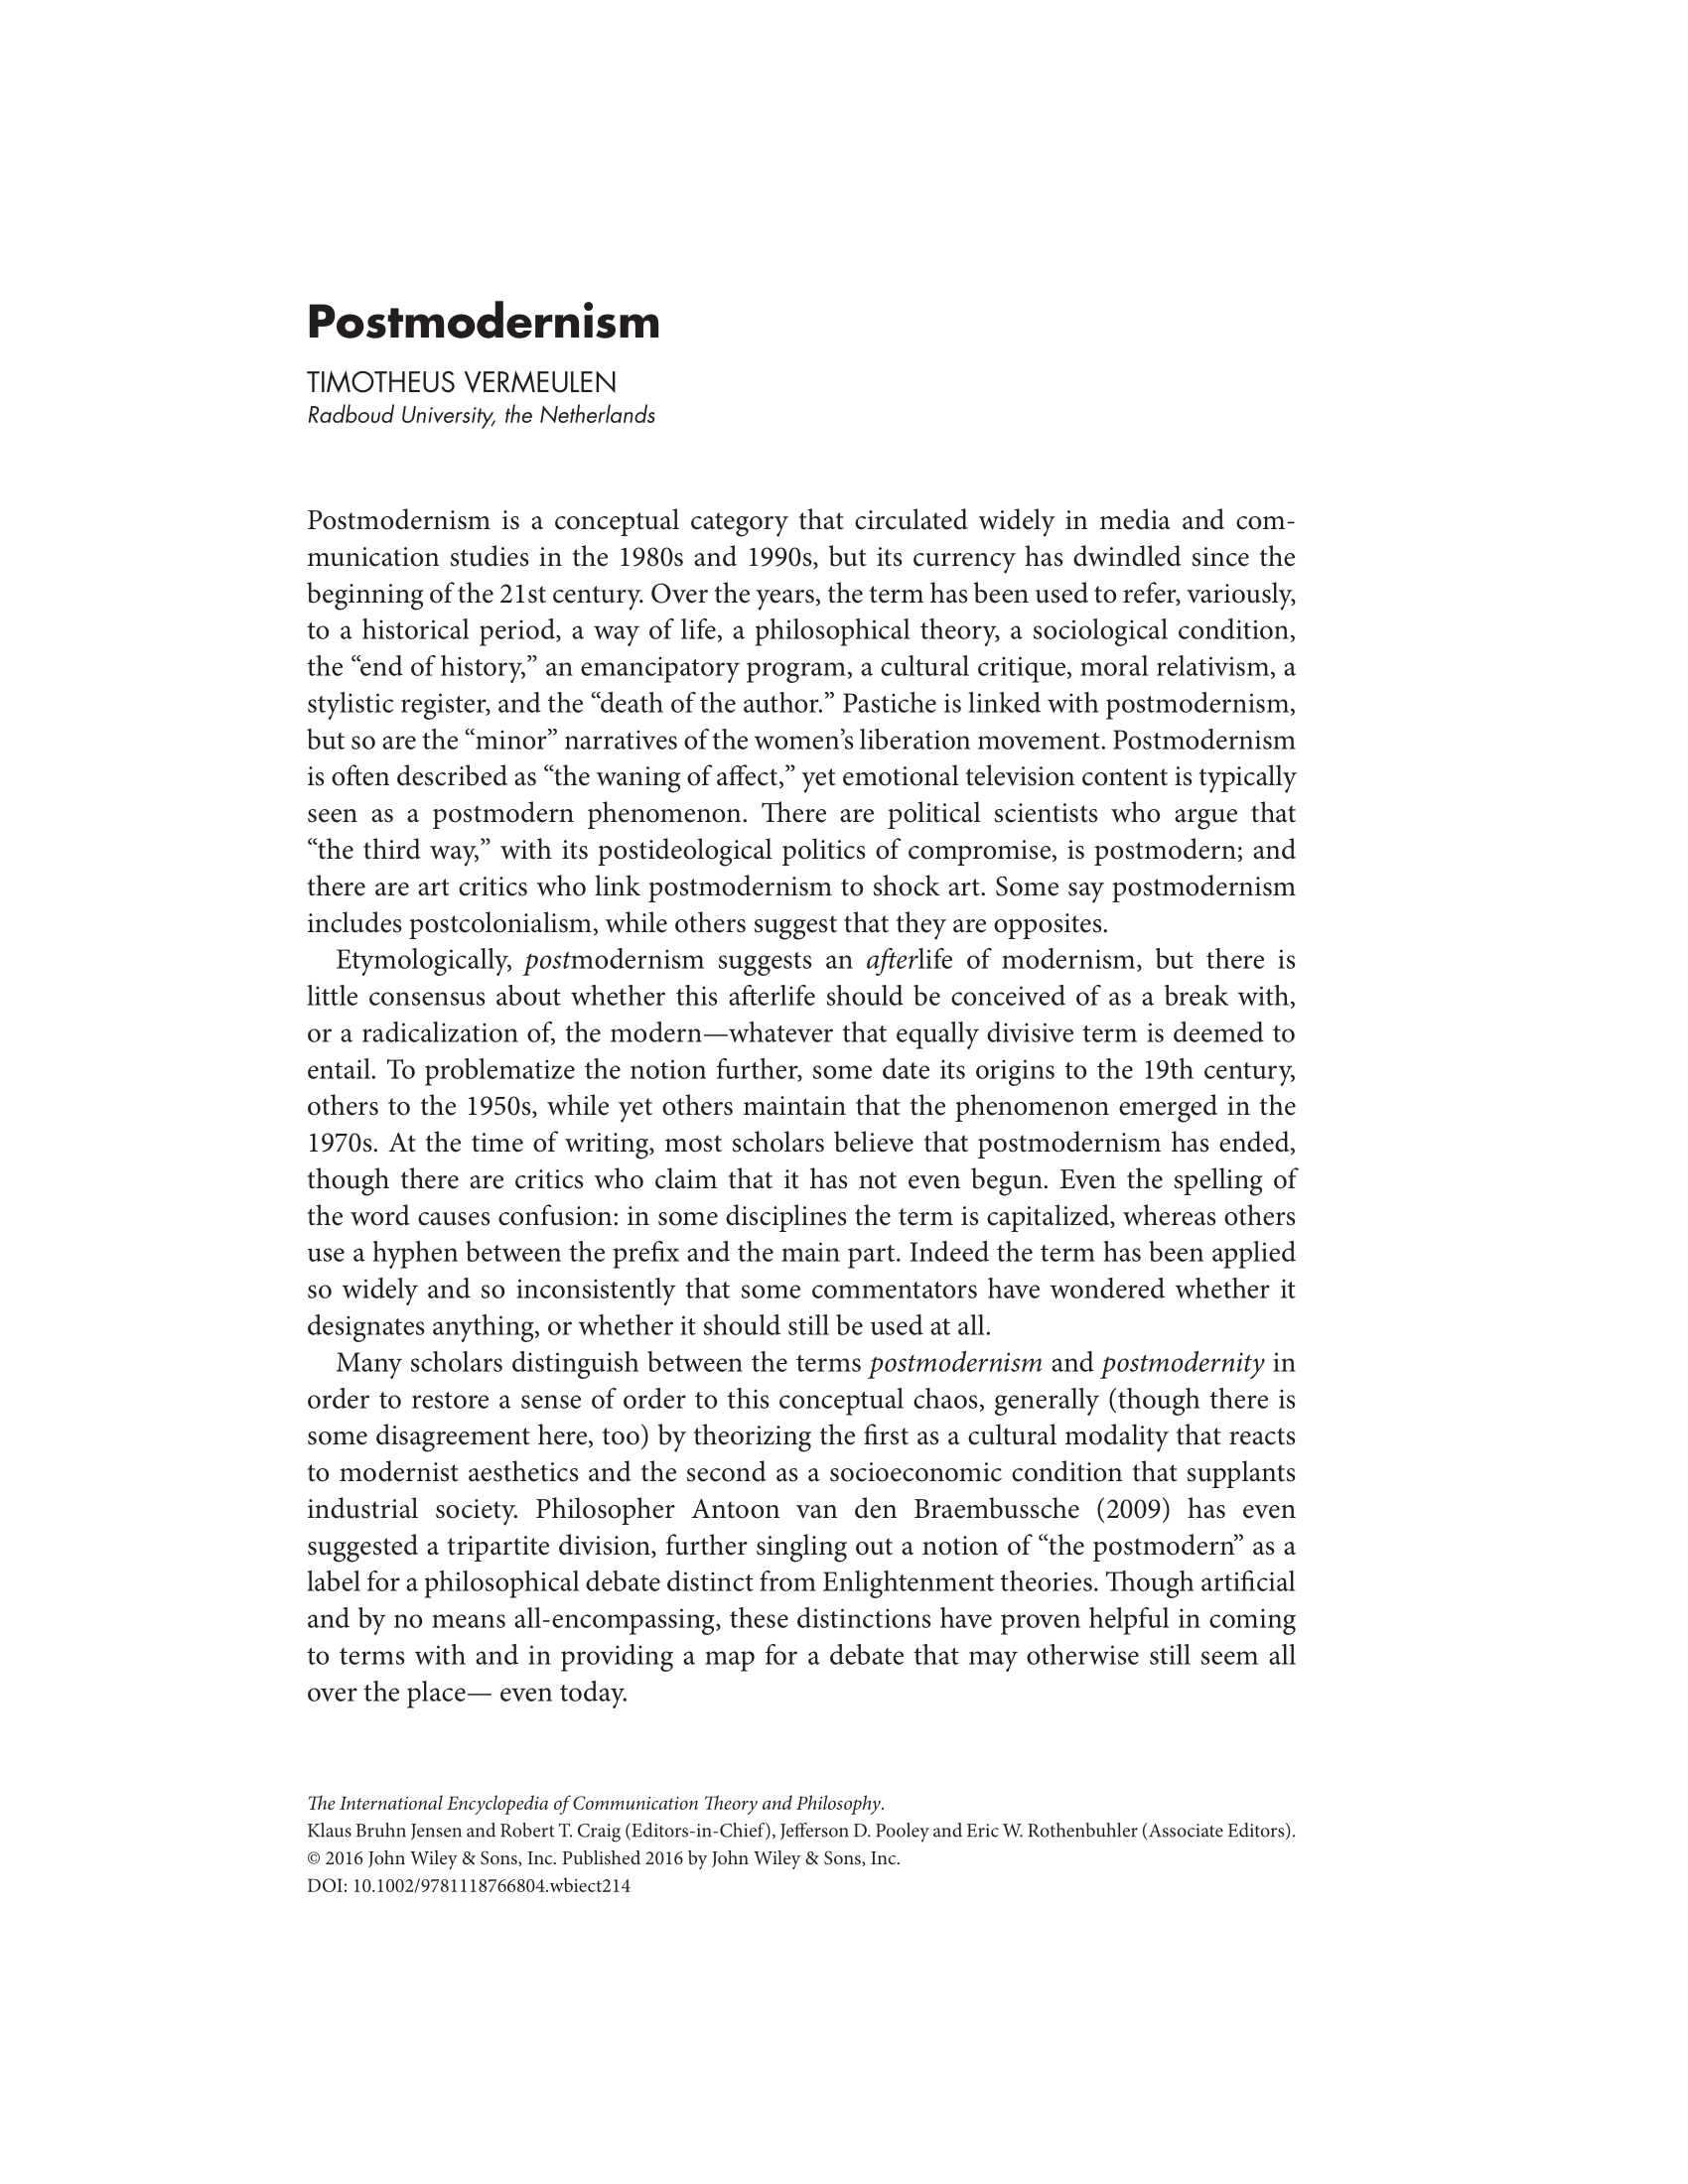 Postmodernism-1.png